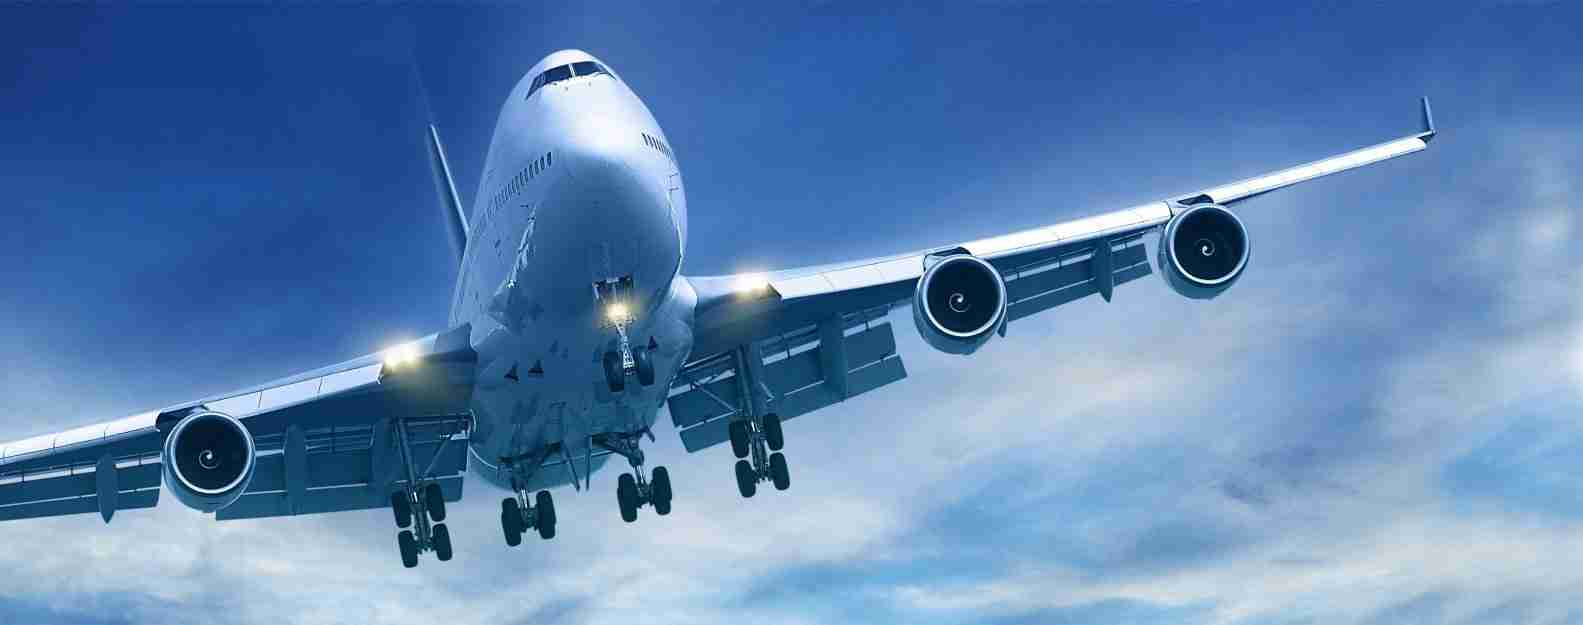 Авиаперевозки в Магадан